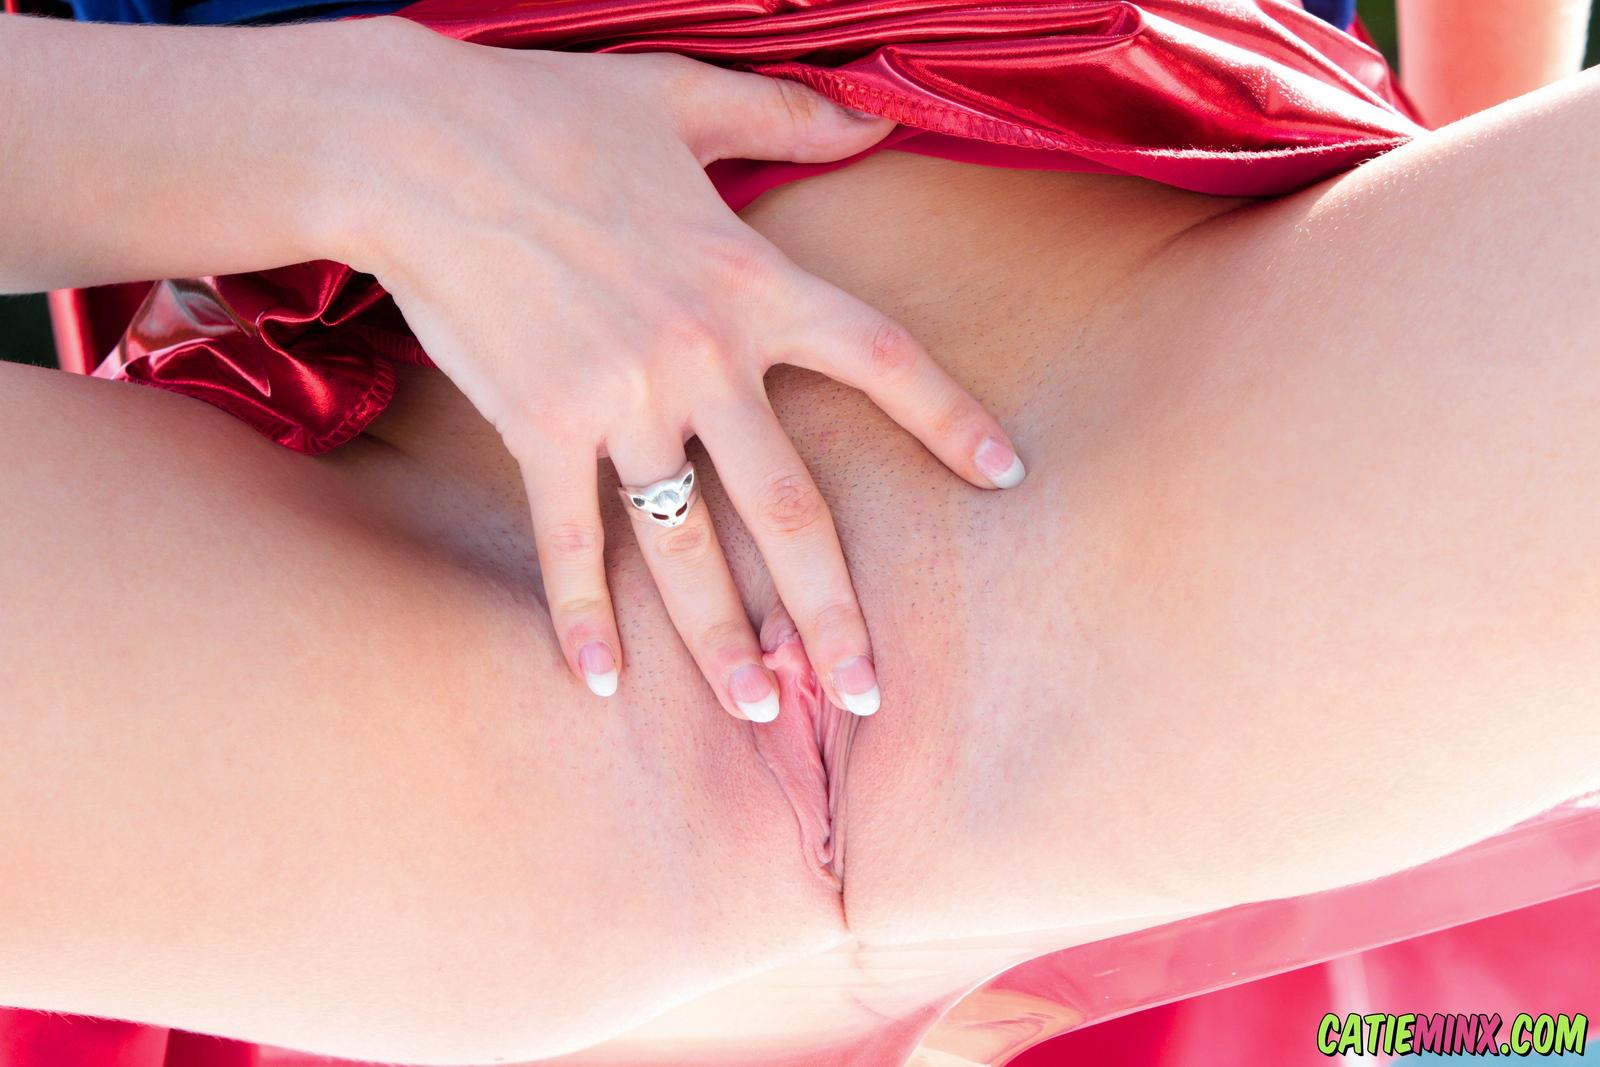 catie-minx-supergirl-costiume-poolside-young-brunette-nude-35